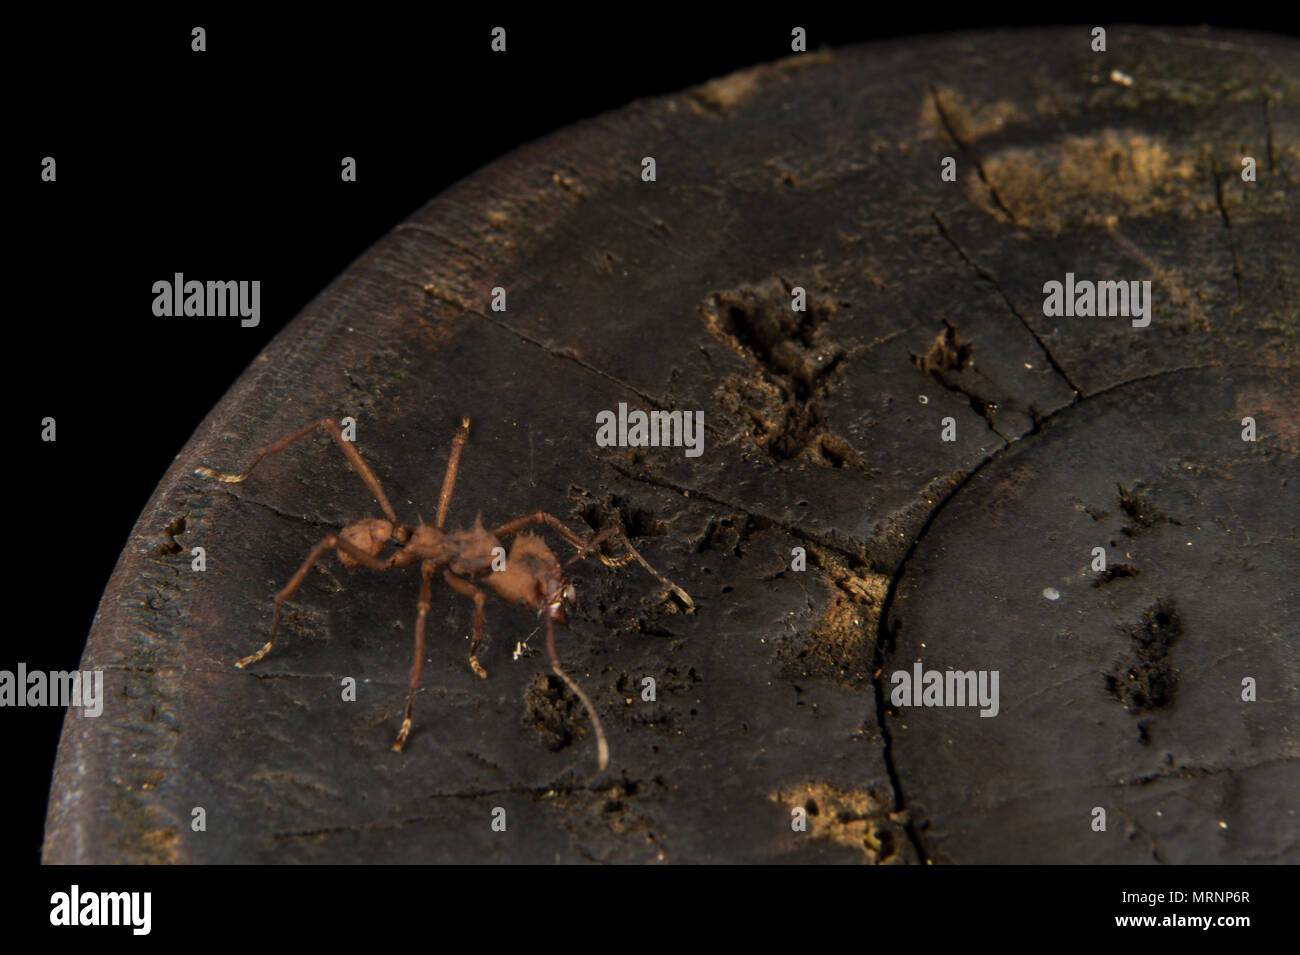 Leaf-cutter ant, Atta sp., Formicidae, Carara National Park, Costa Rica Stock Photo